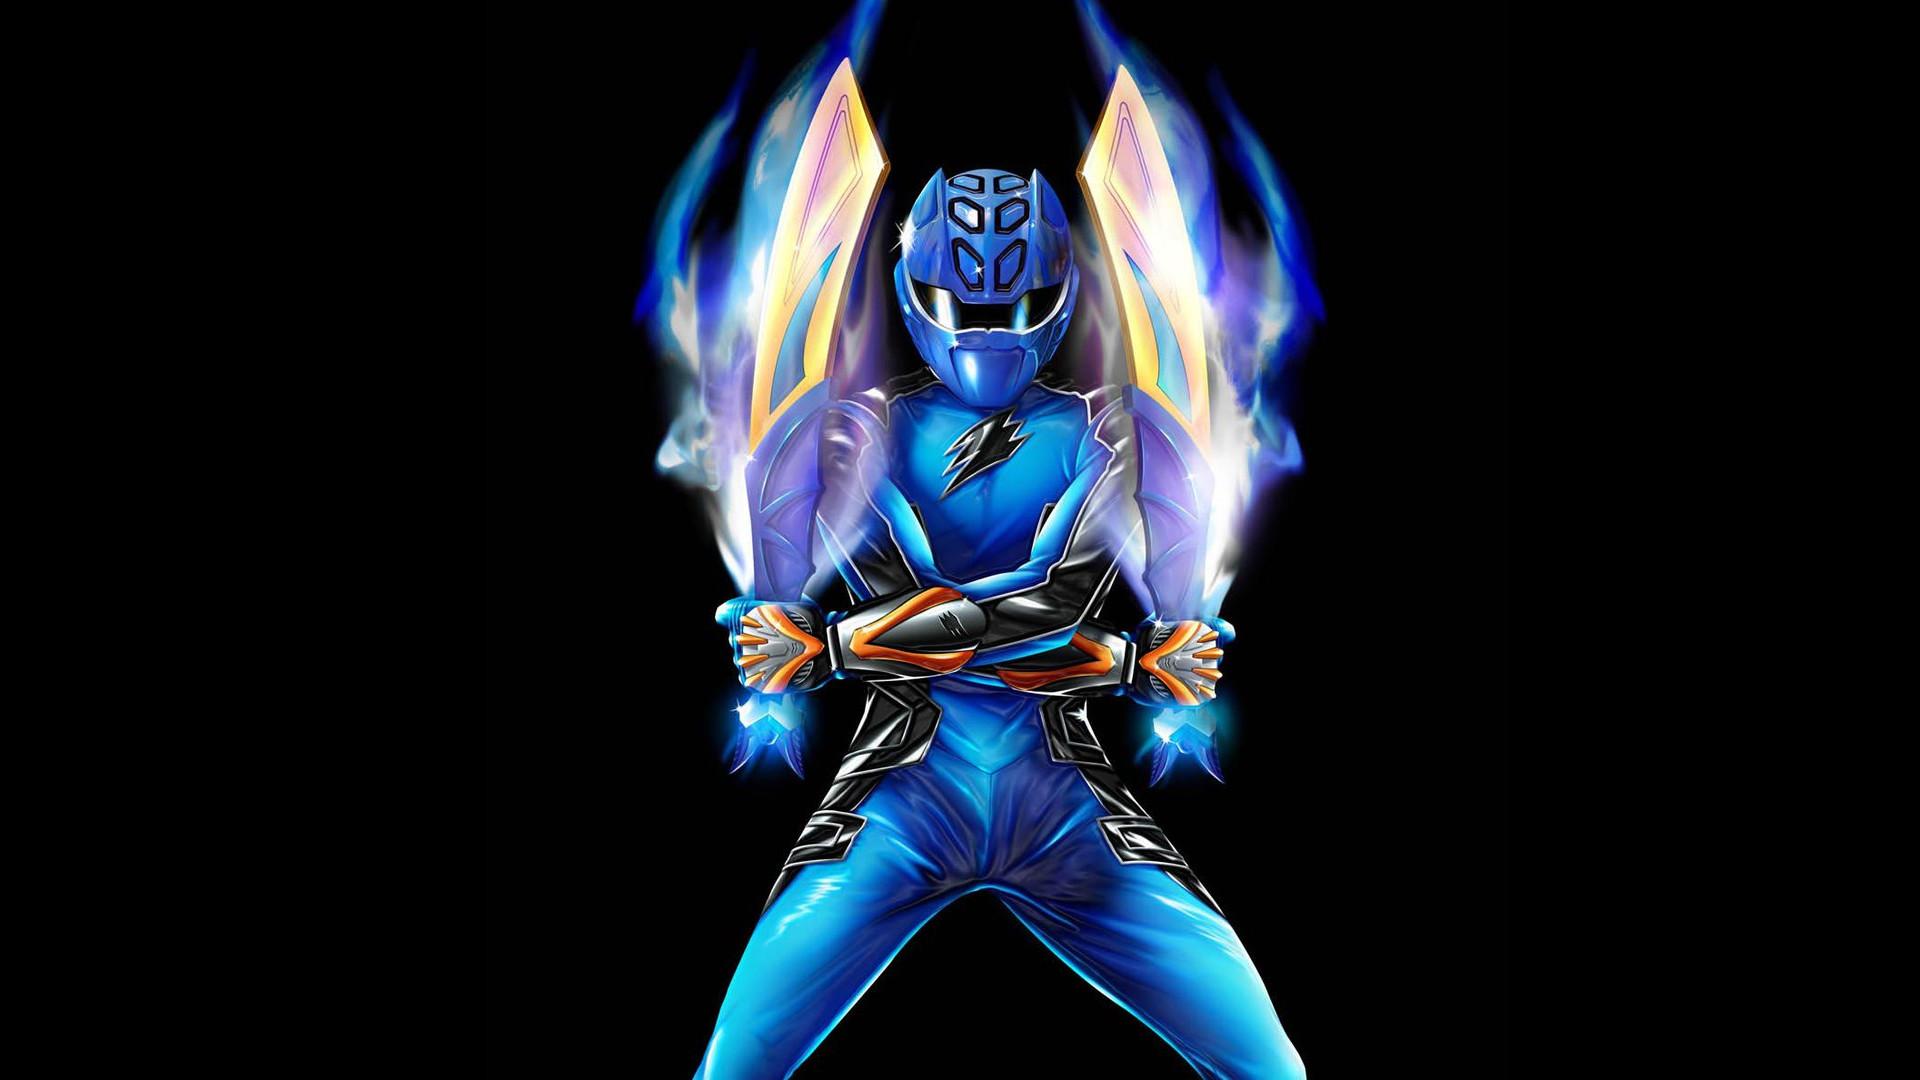 130 Mighty Morphin Power Rangers